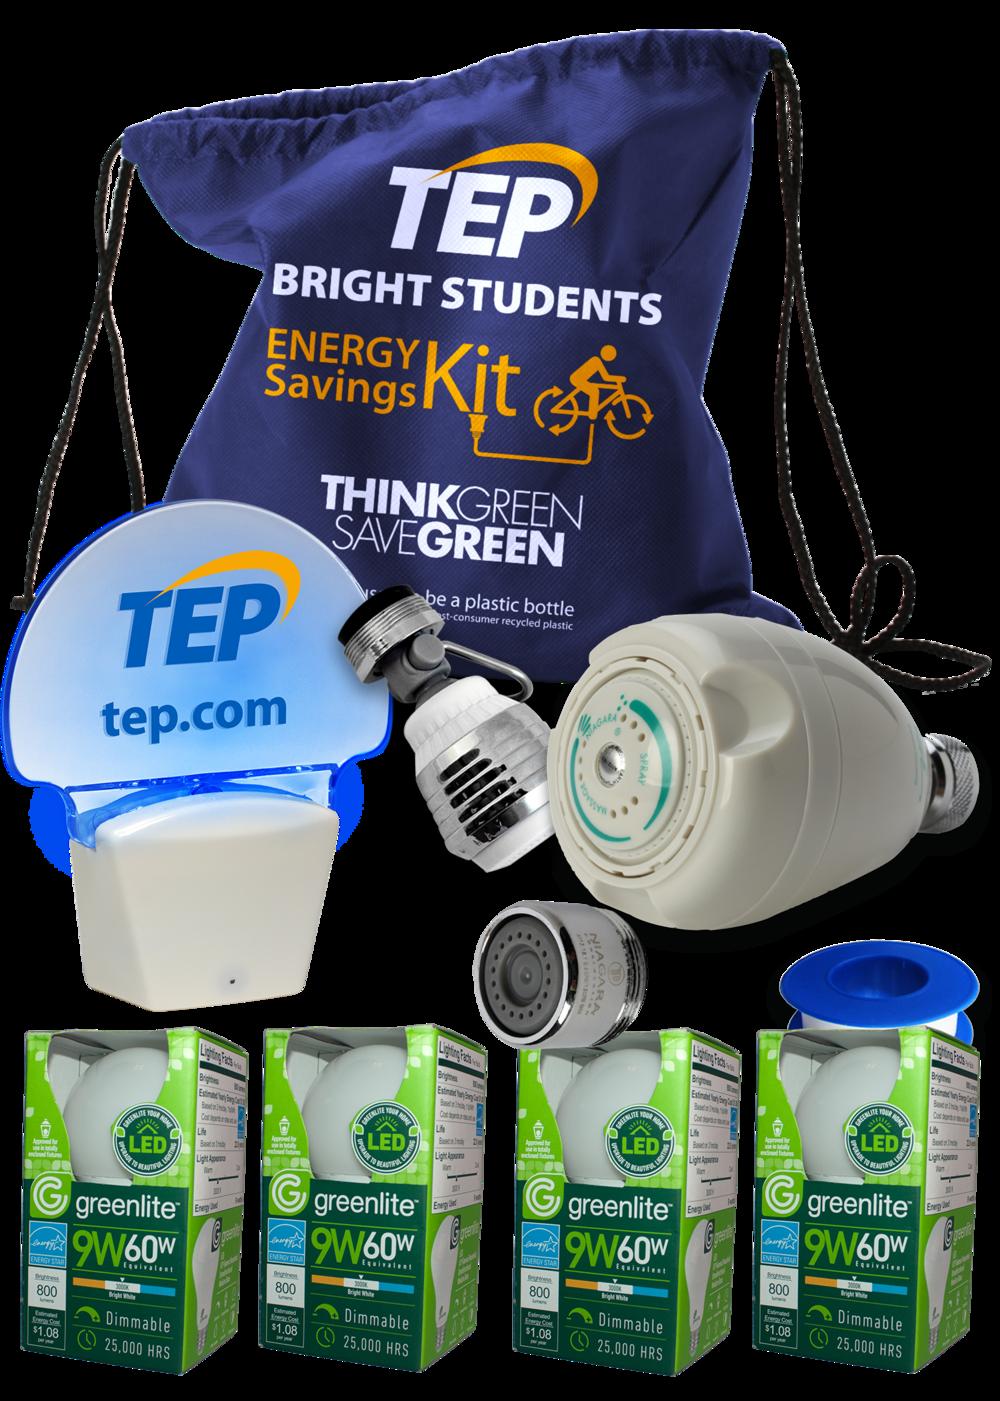 Each student receives an Energy Savings Kit.